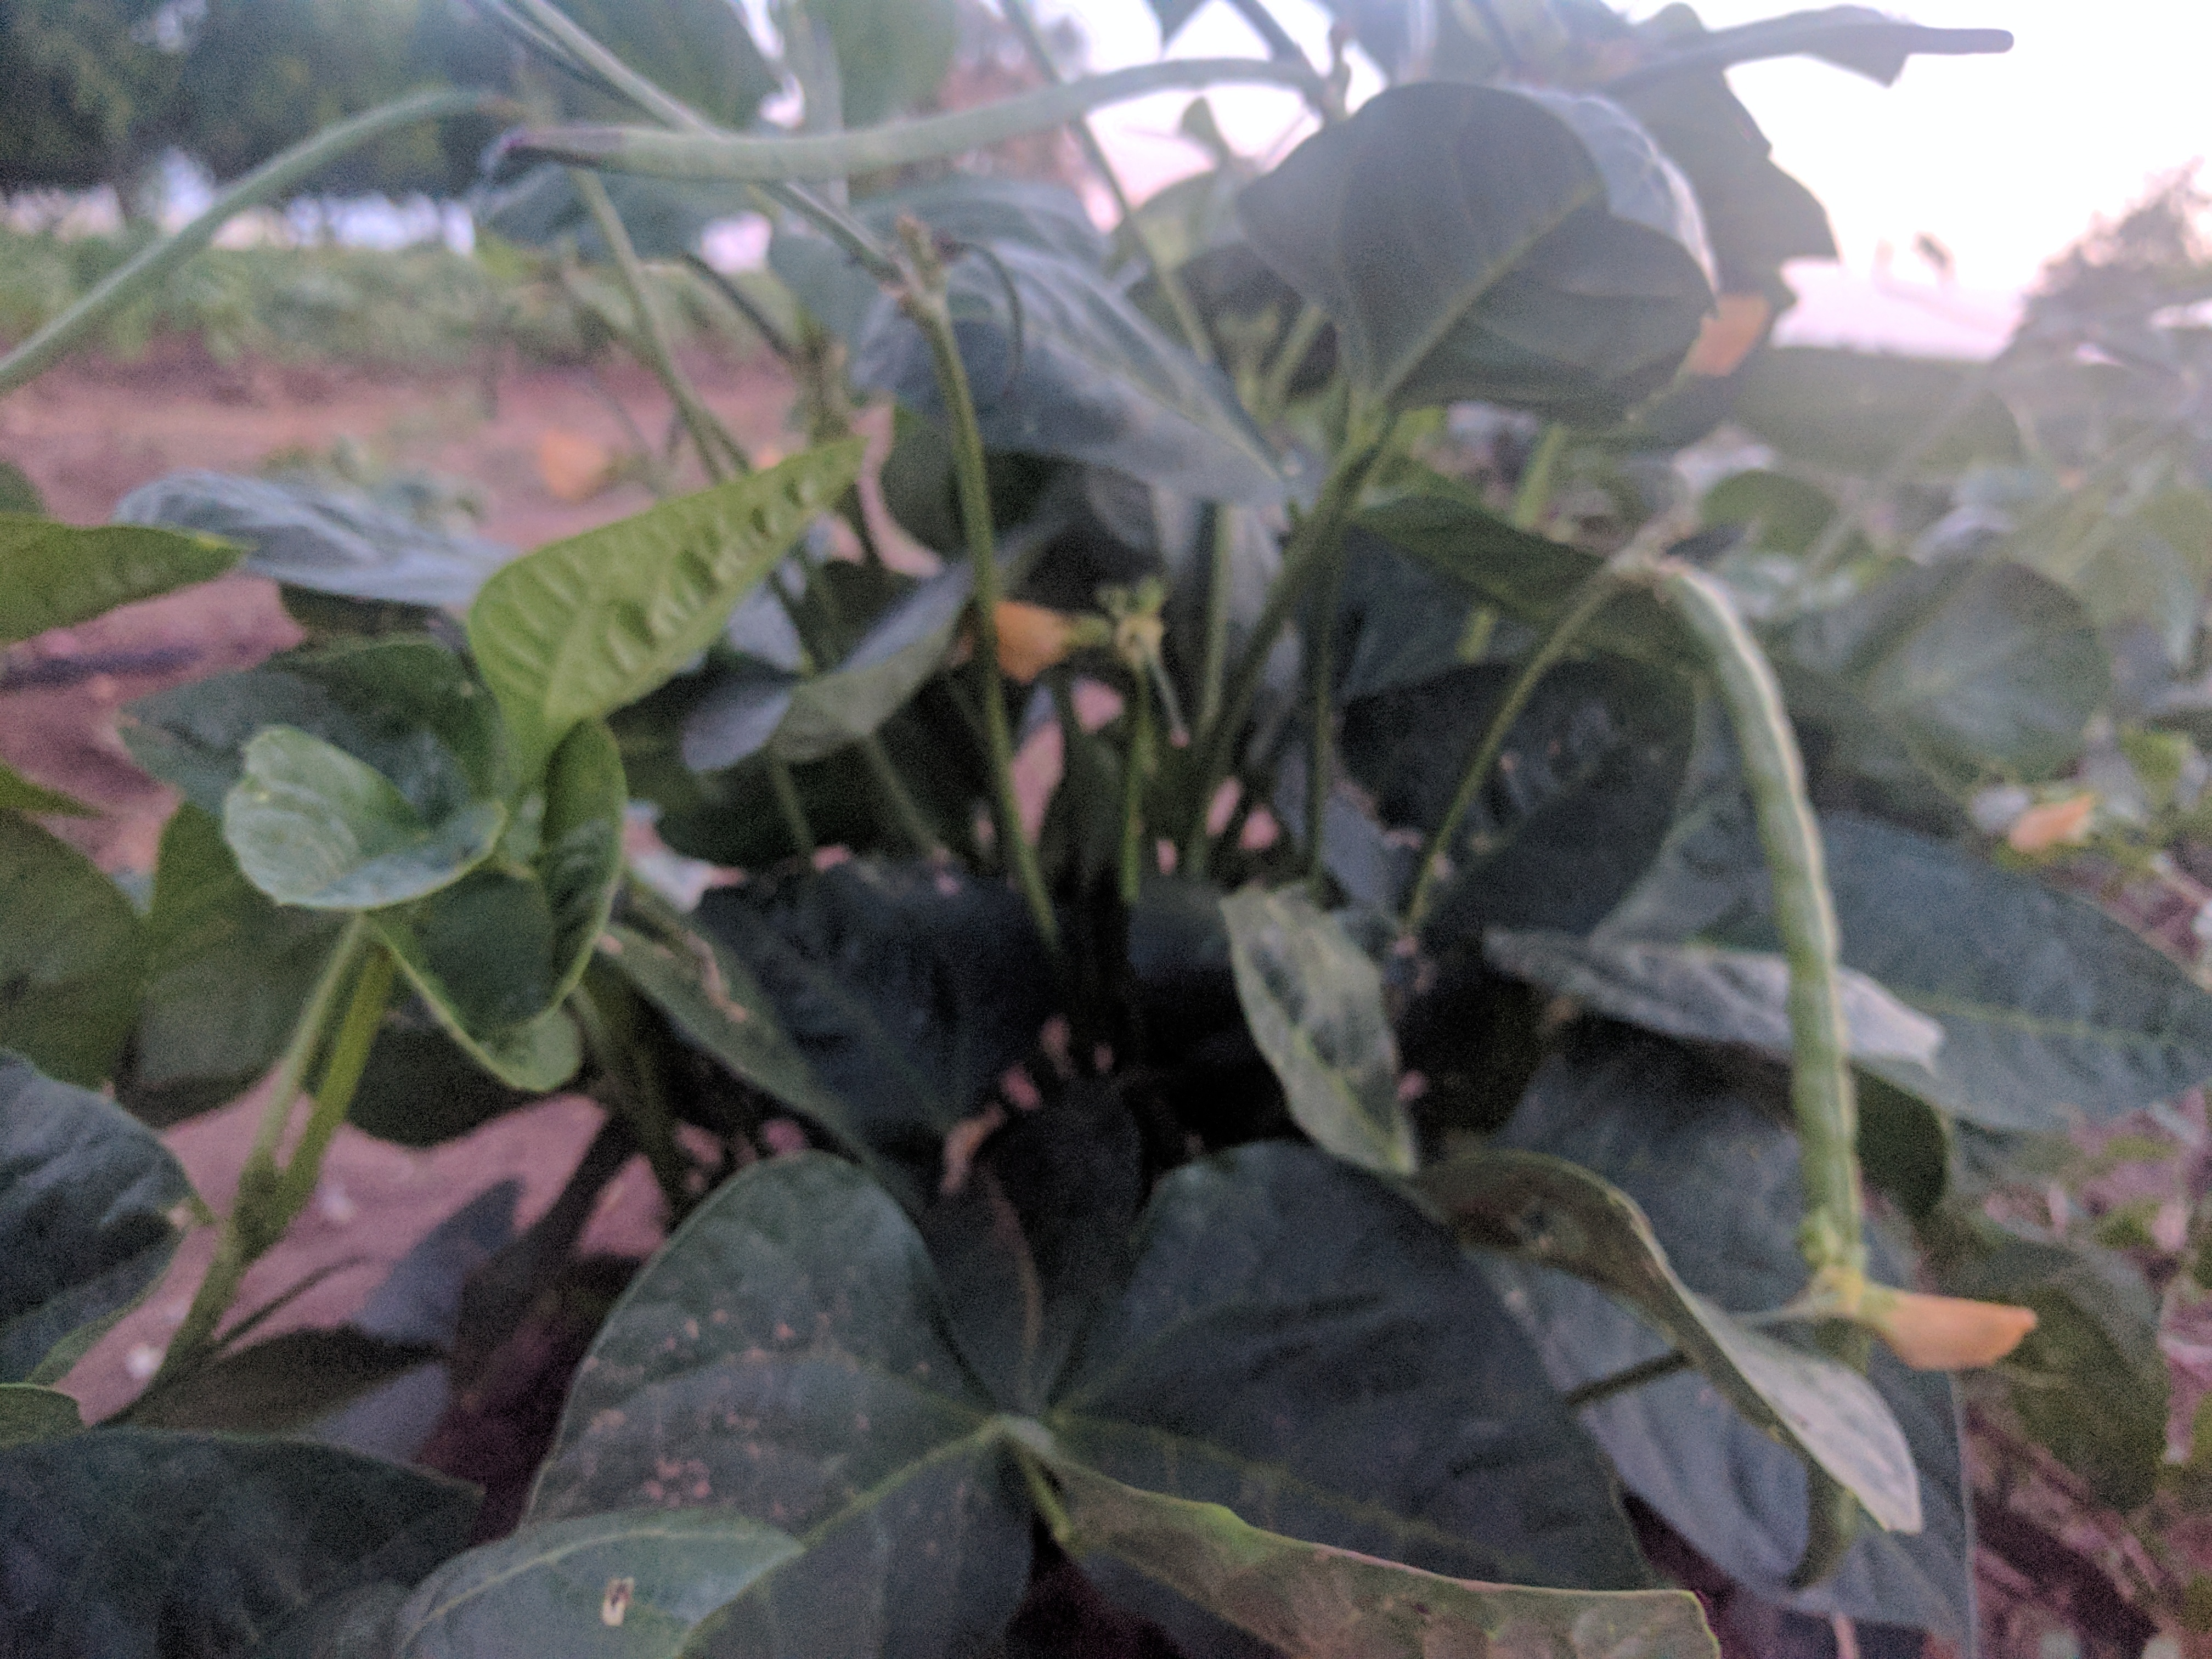 Blackeyed Peas Almost Ready